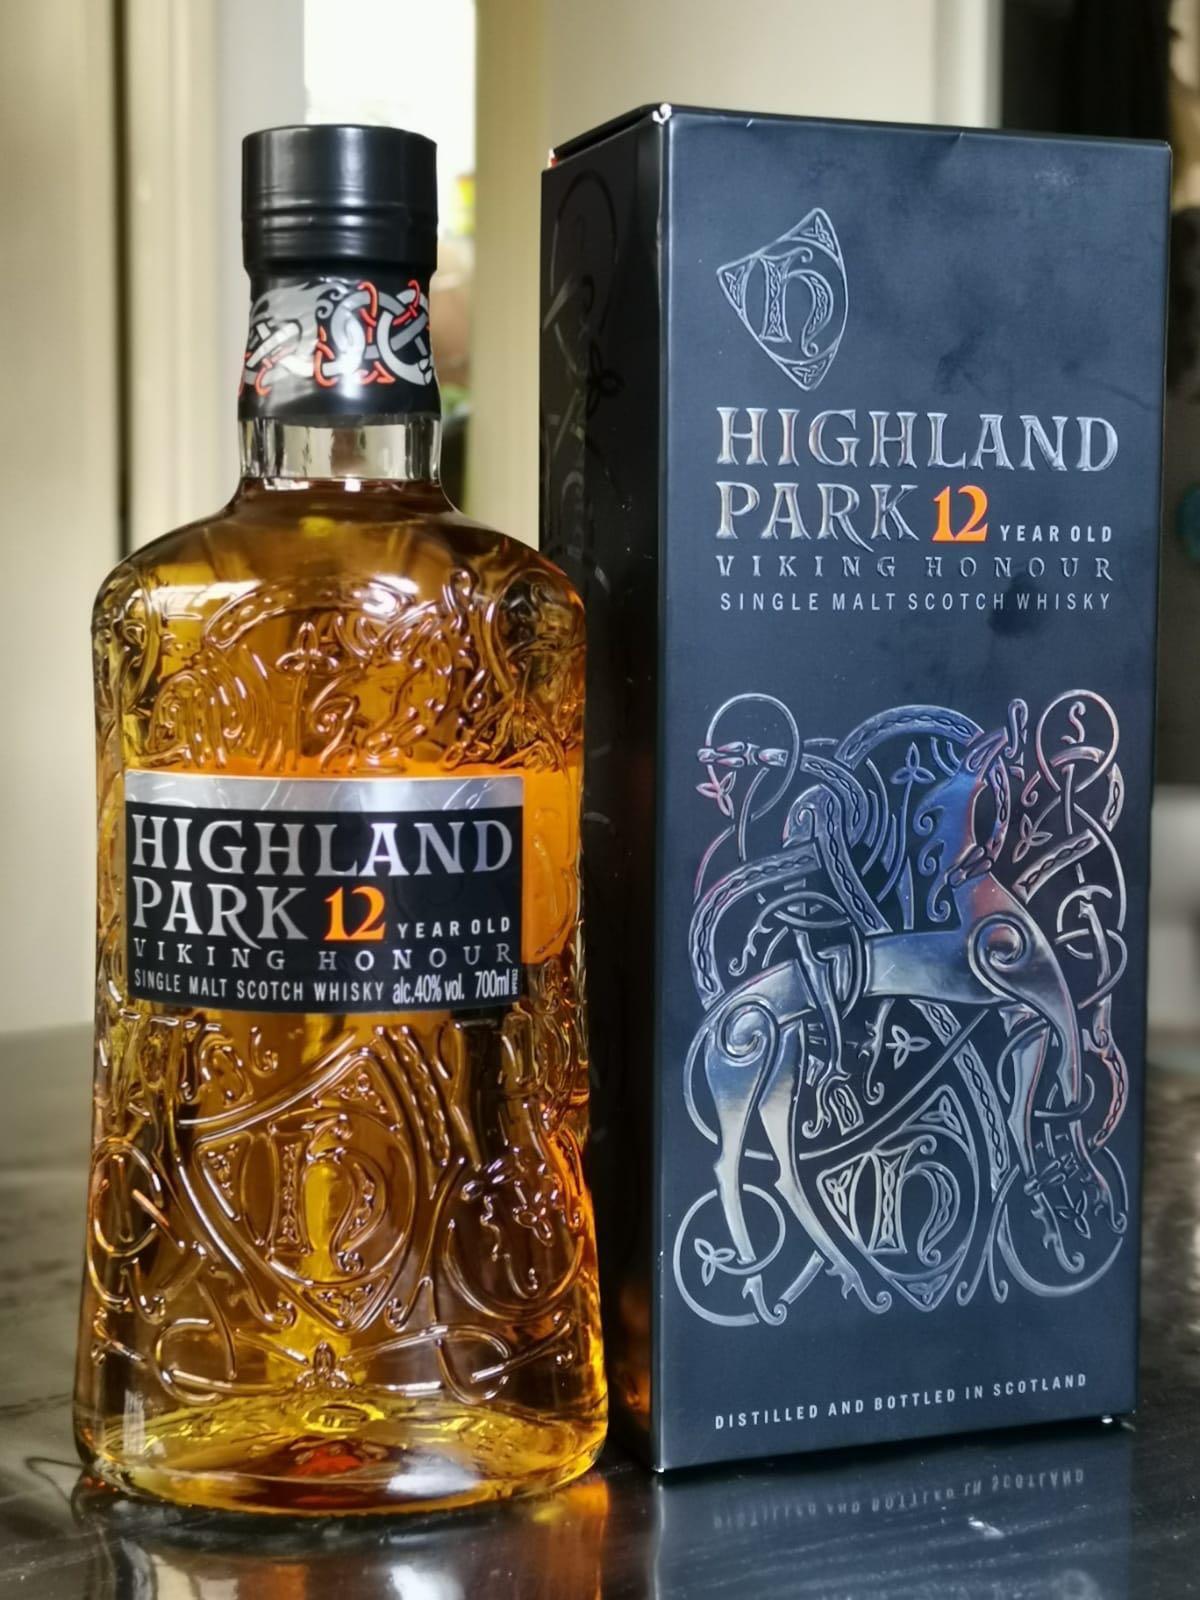 高原騎士12年單一麥芽威士忌 - Highland Park 12 Years Old Single Malt Scotch Whisky